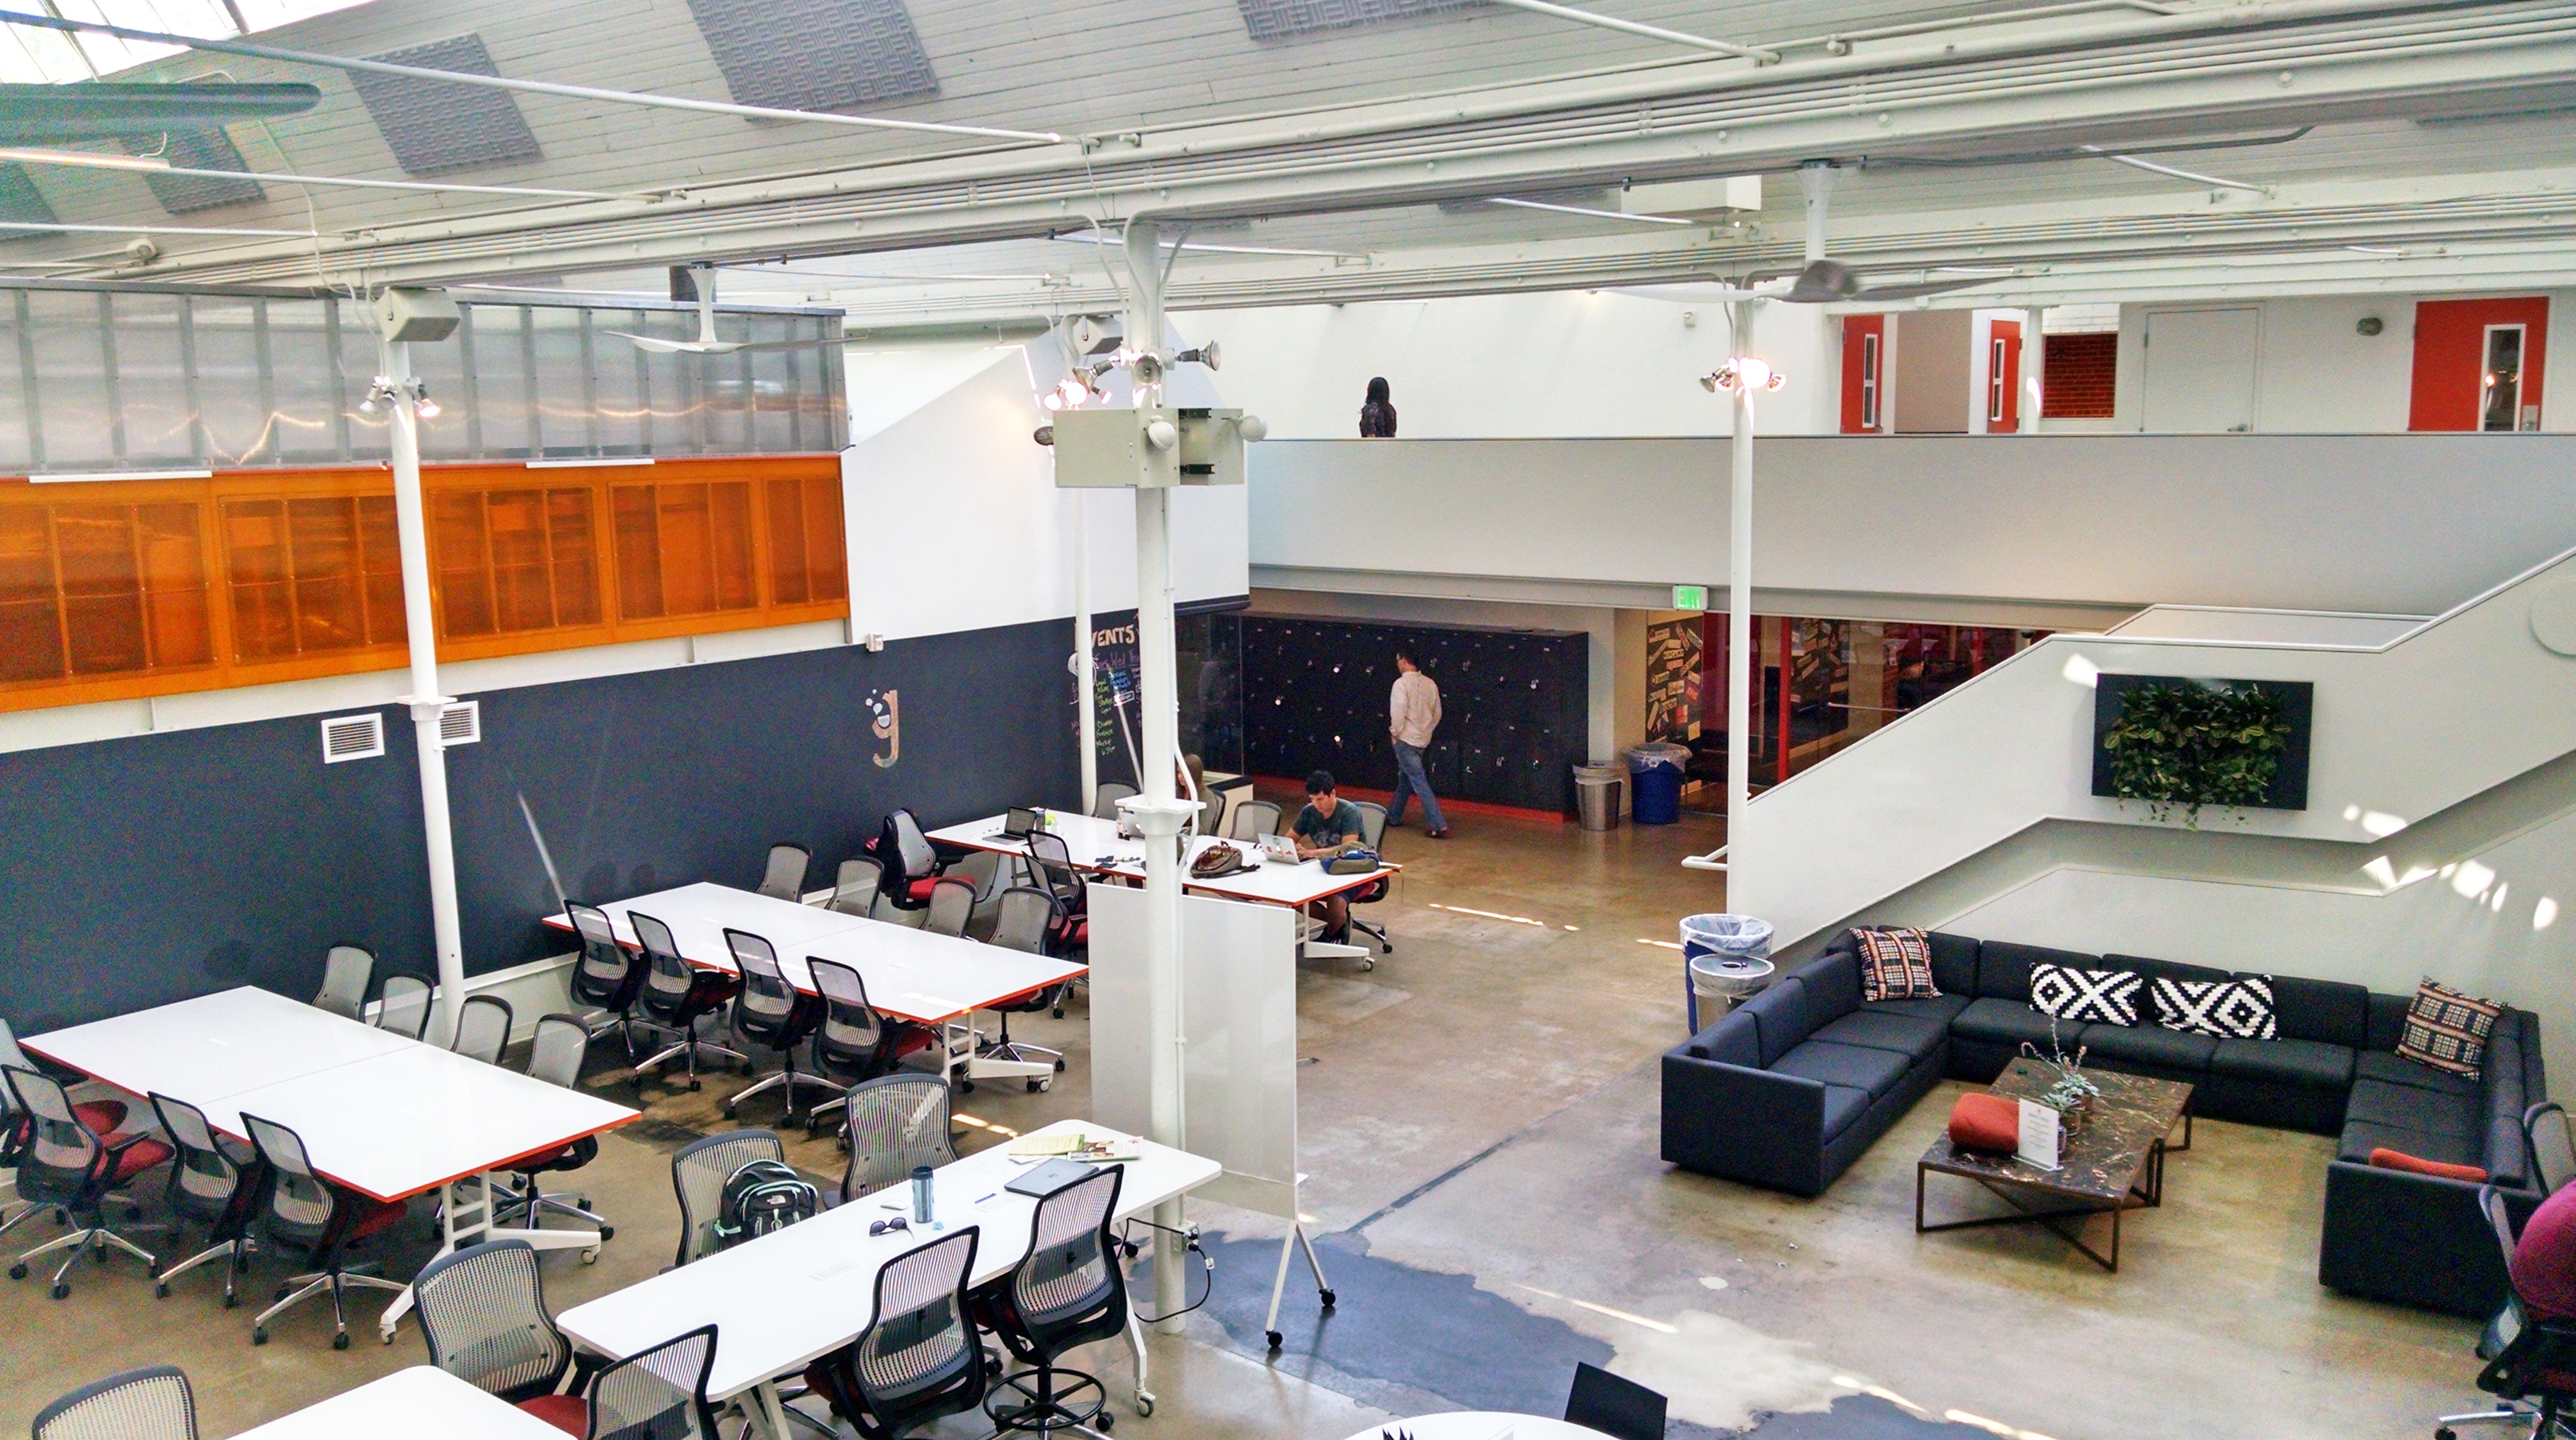 galvanize 1.0 adaptive reuse cowork space open studio architecture OSA